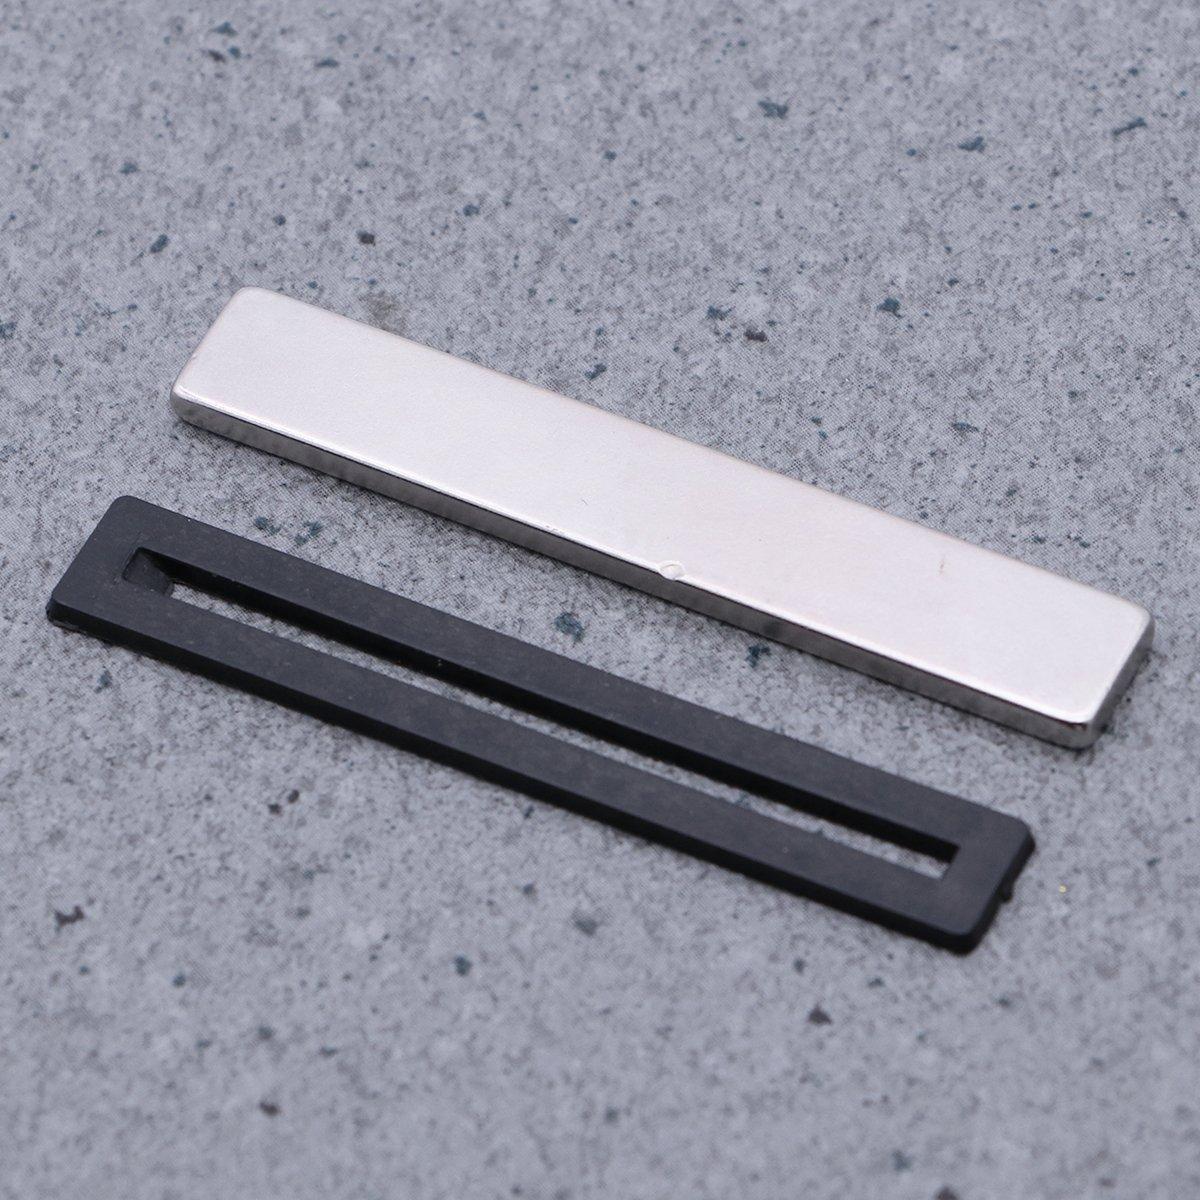 OUNONA Magneti Calamite neodimio Magneti in Terre Rare Magneti permanenti 60x10x3mm 6 Pezzi